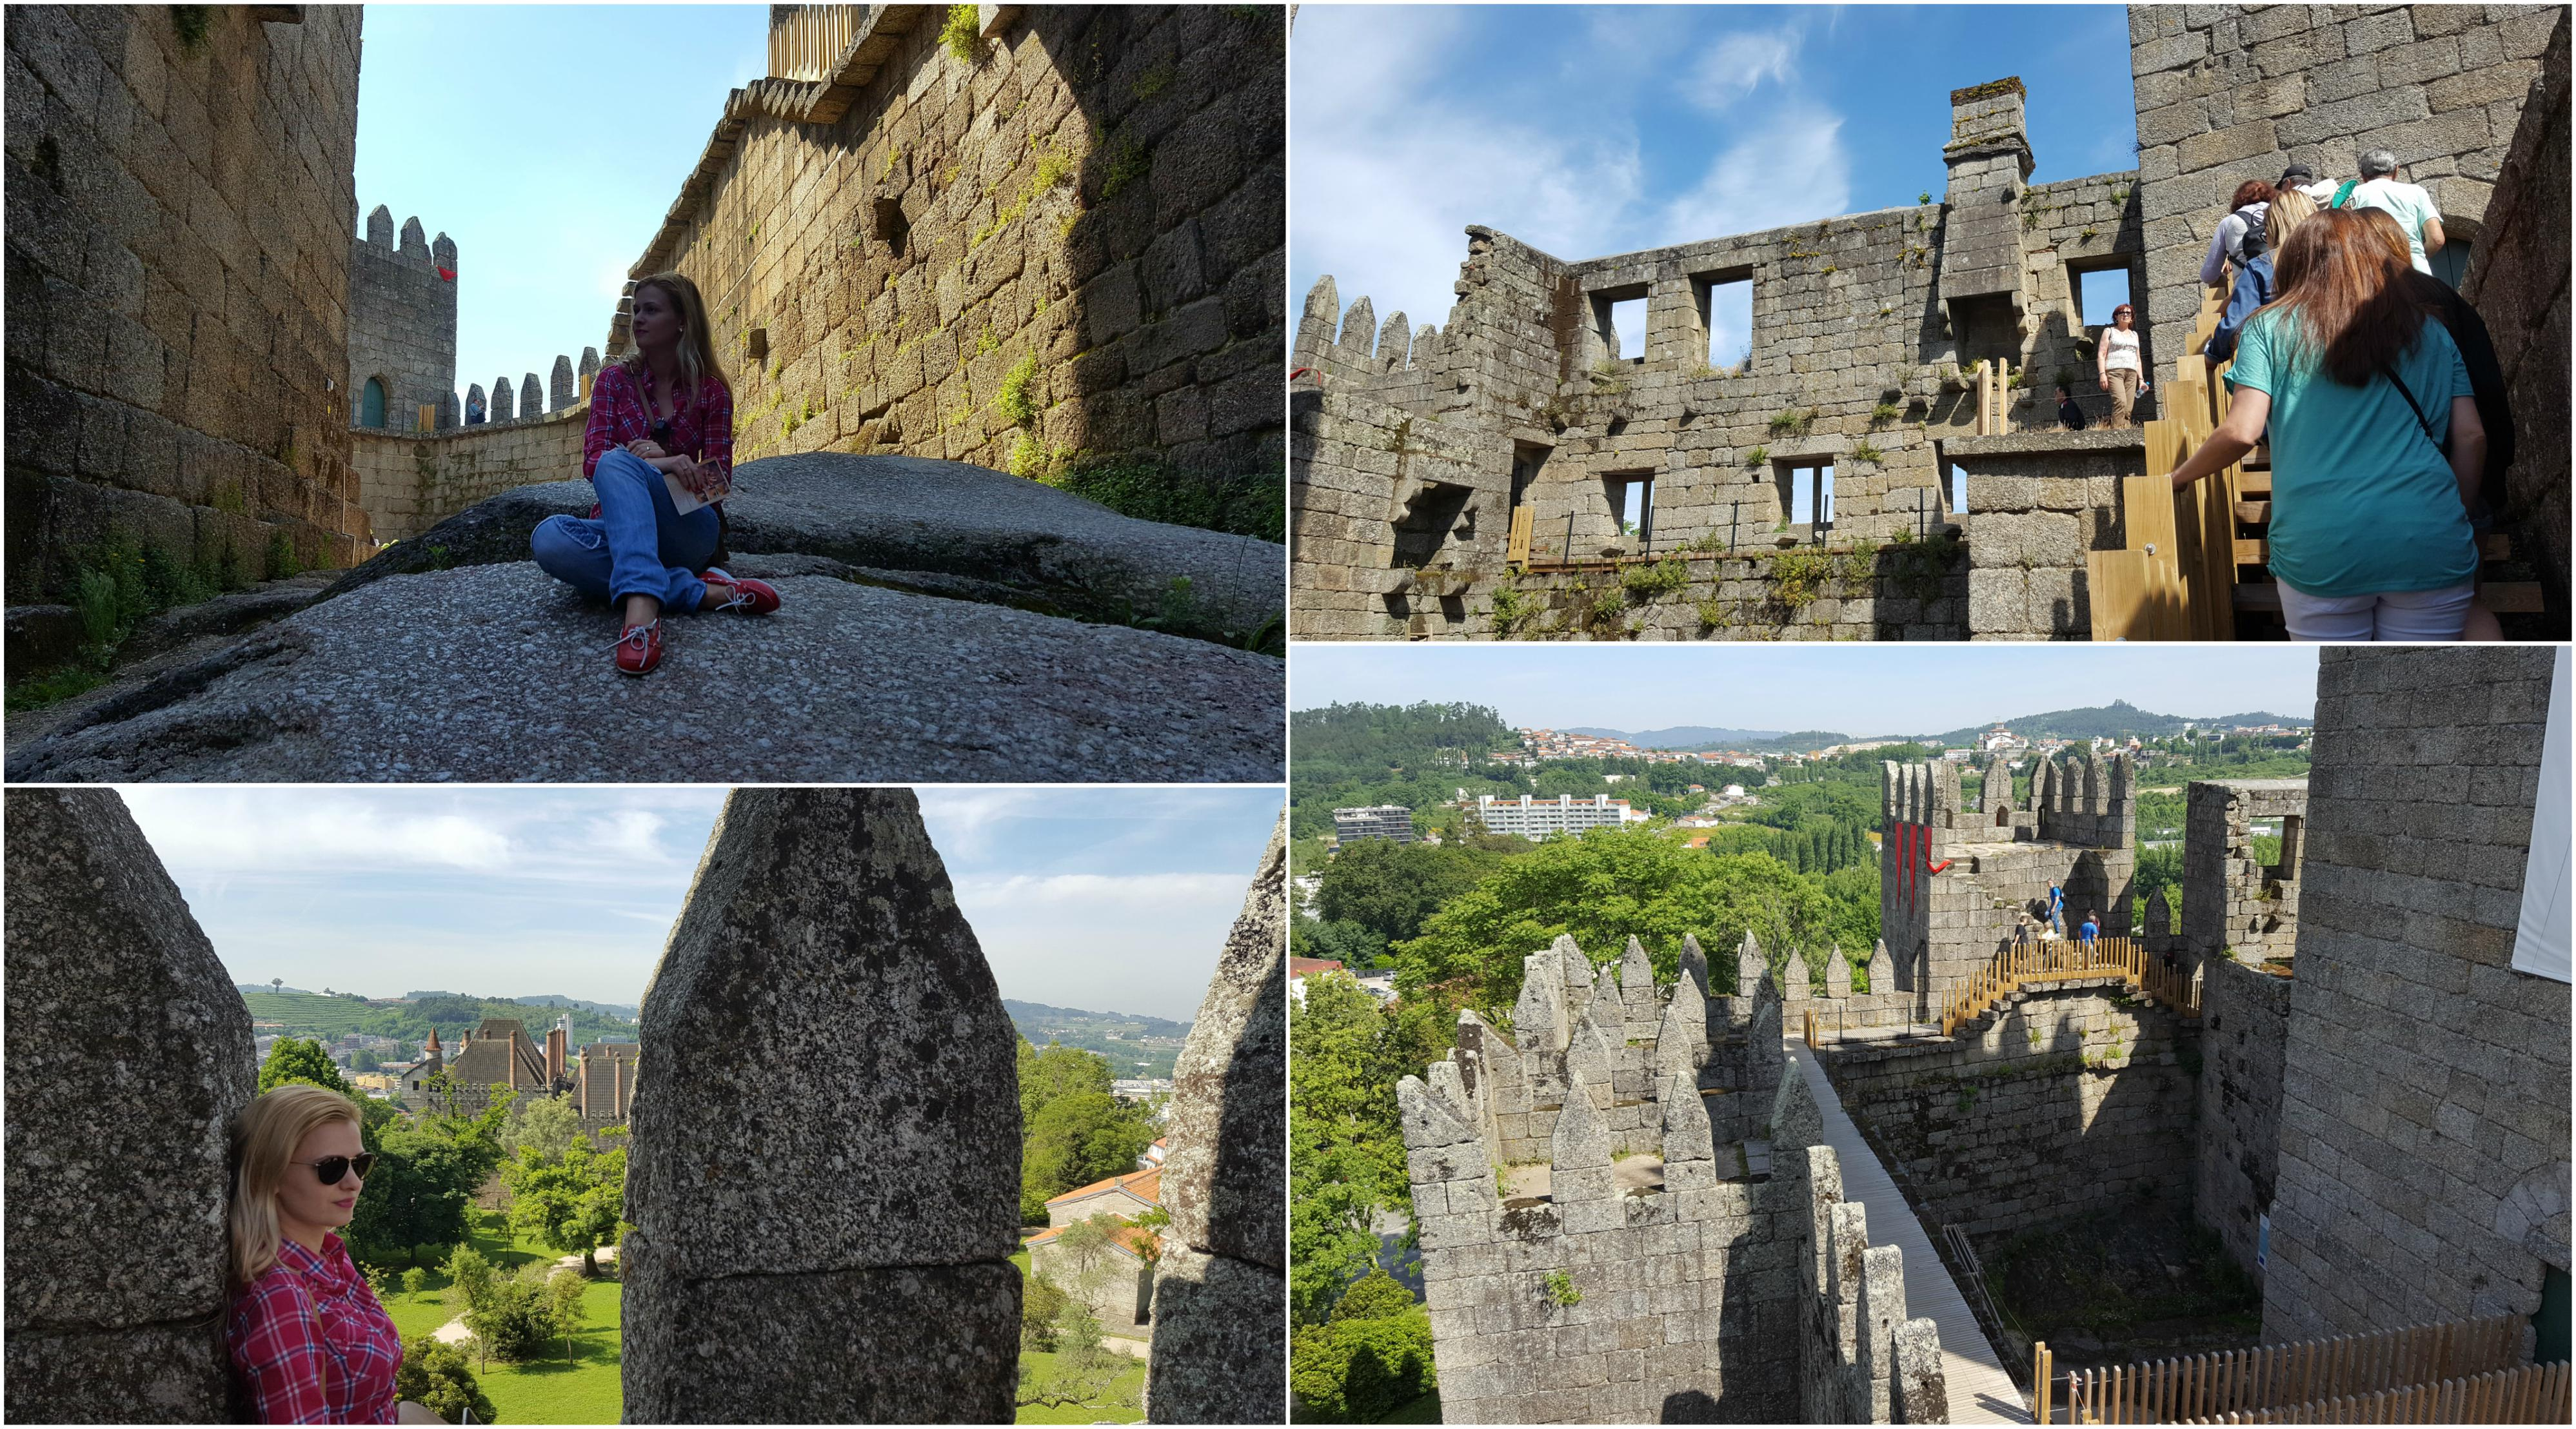 castelo 1